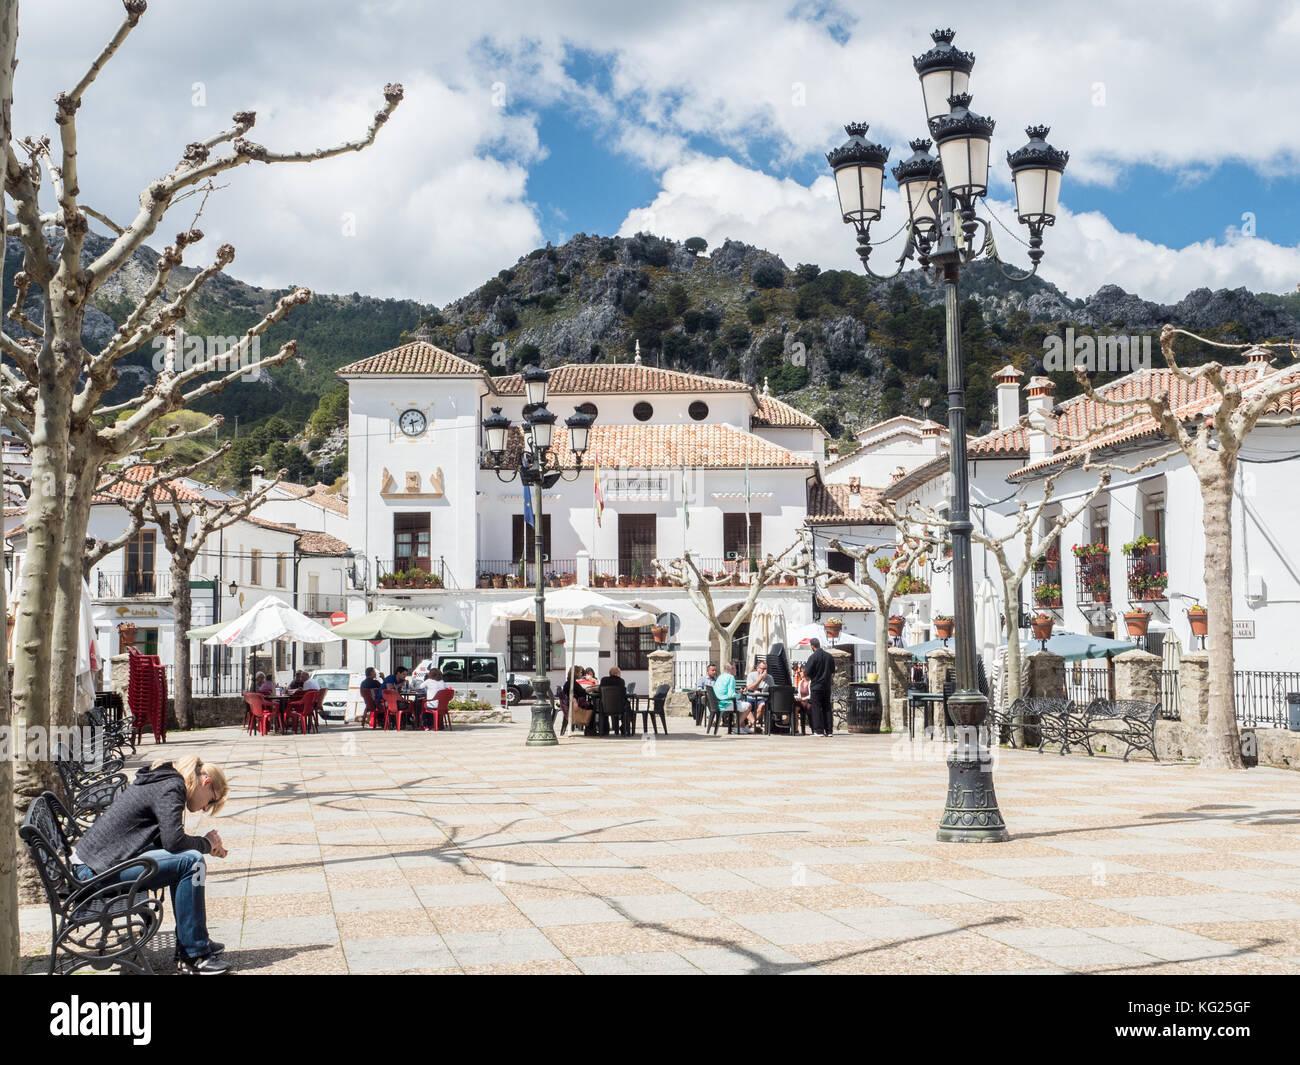 Main plaza, Grazalema, Andalucia, Spain, Europe - Stock Image